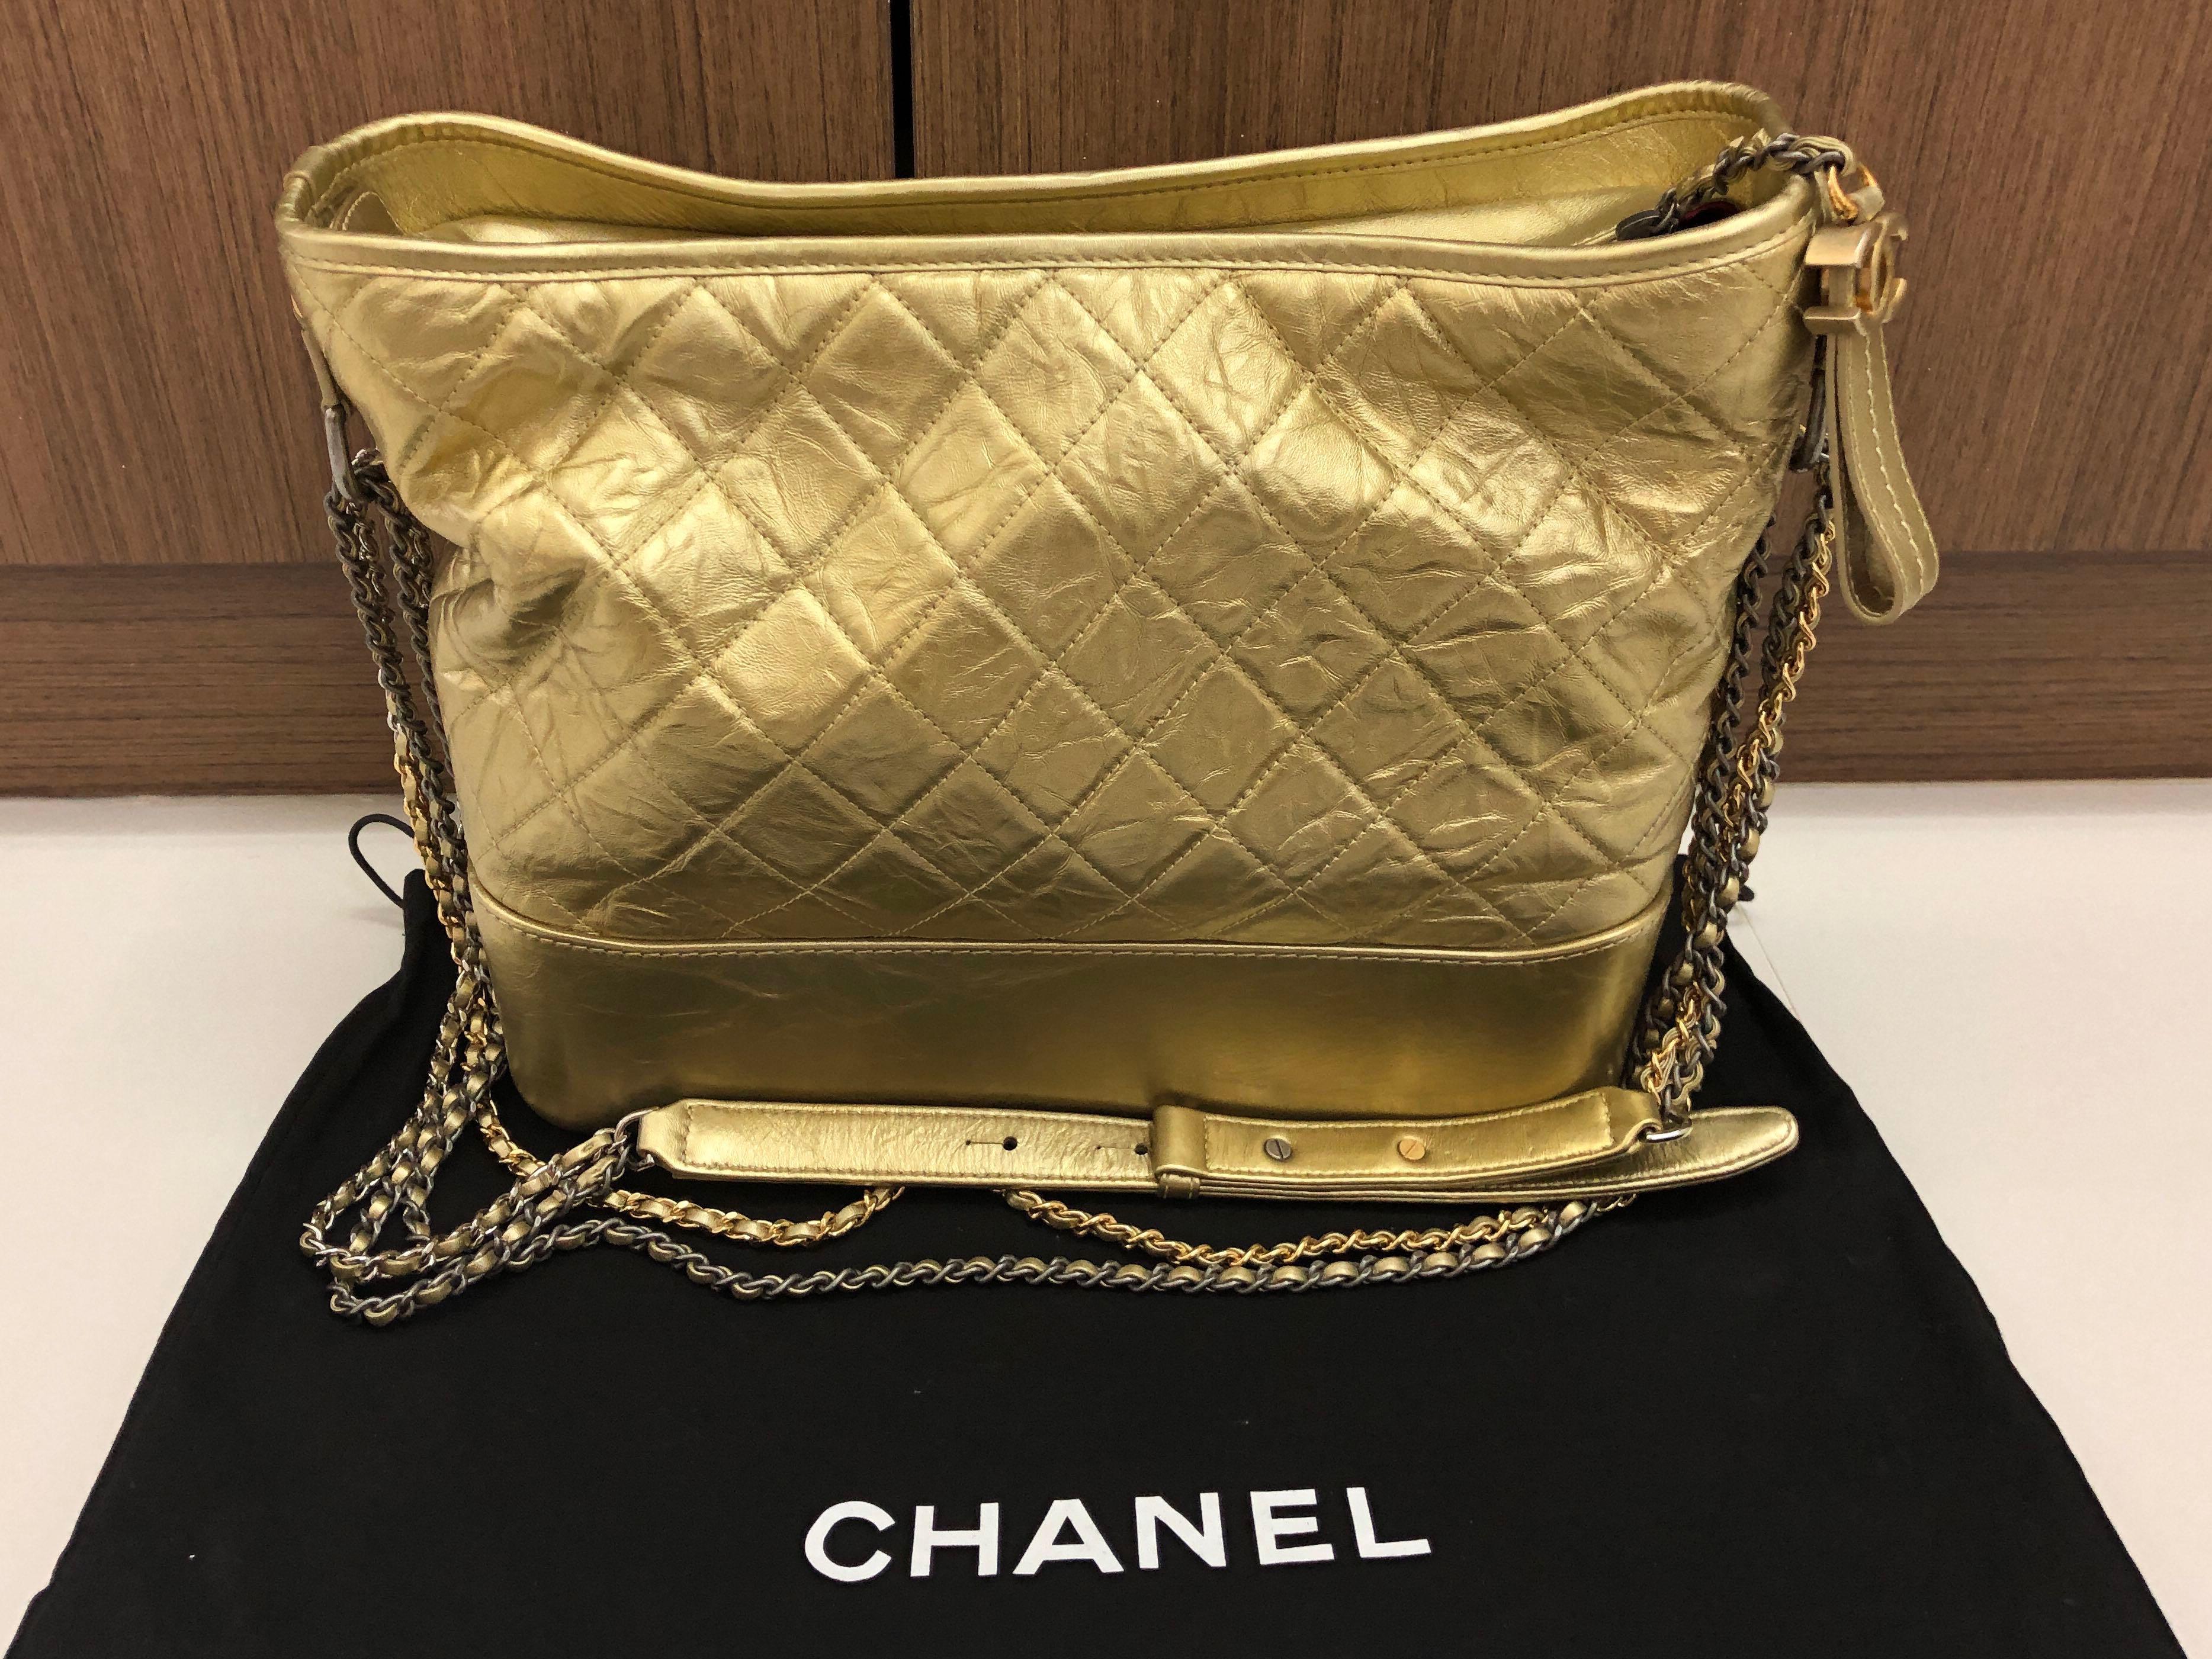 387ad081a2ca Chanel Gabrielle Hobo Bag - Metallic Gold, Luxury, Bags & Wallets, Handbags  on Carousell